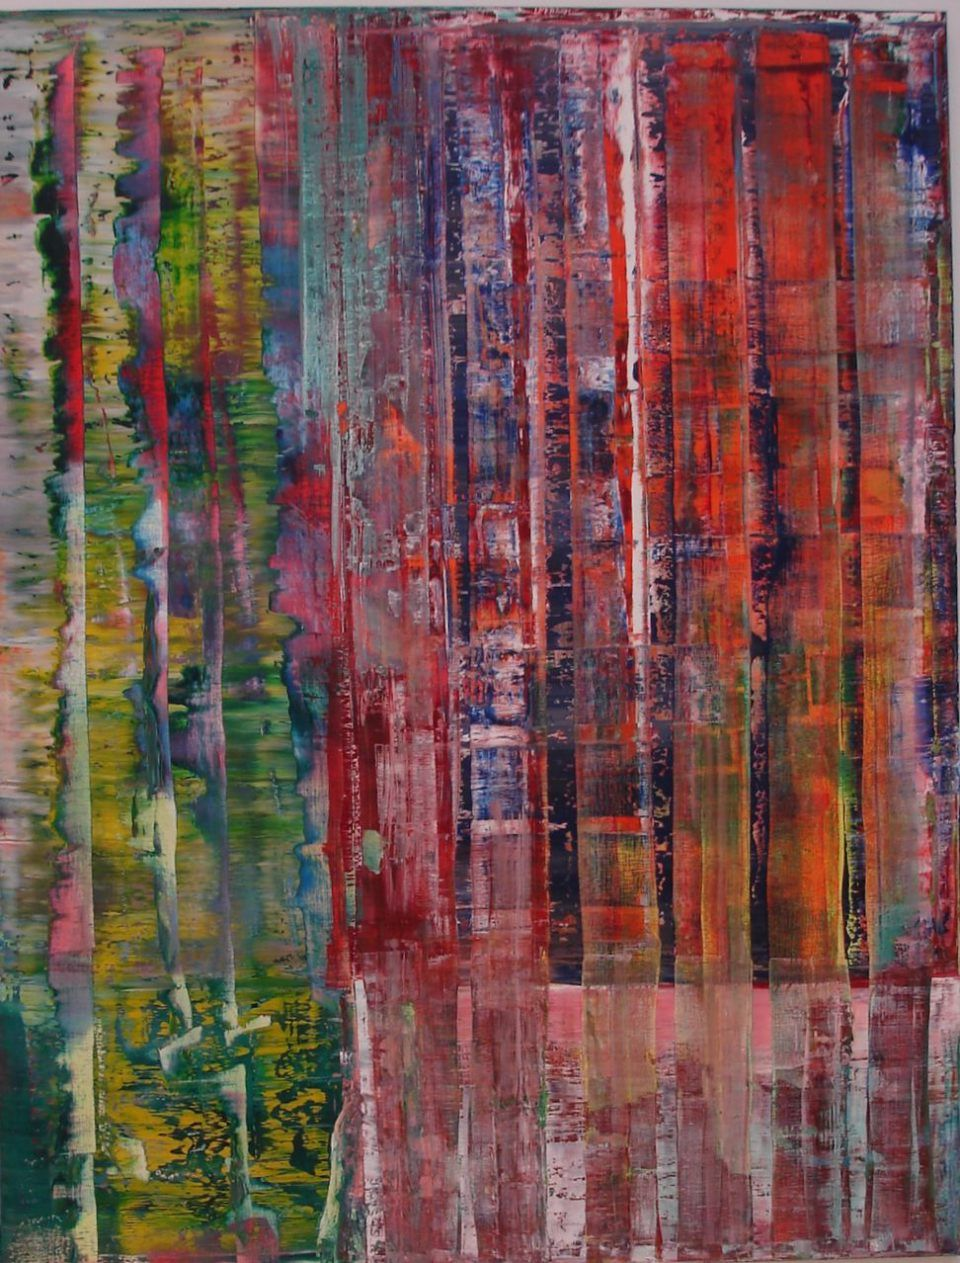 gerhard richter abstrakte bilder malerei abstrakt acrylbilder kaufen kandinsky